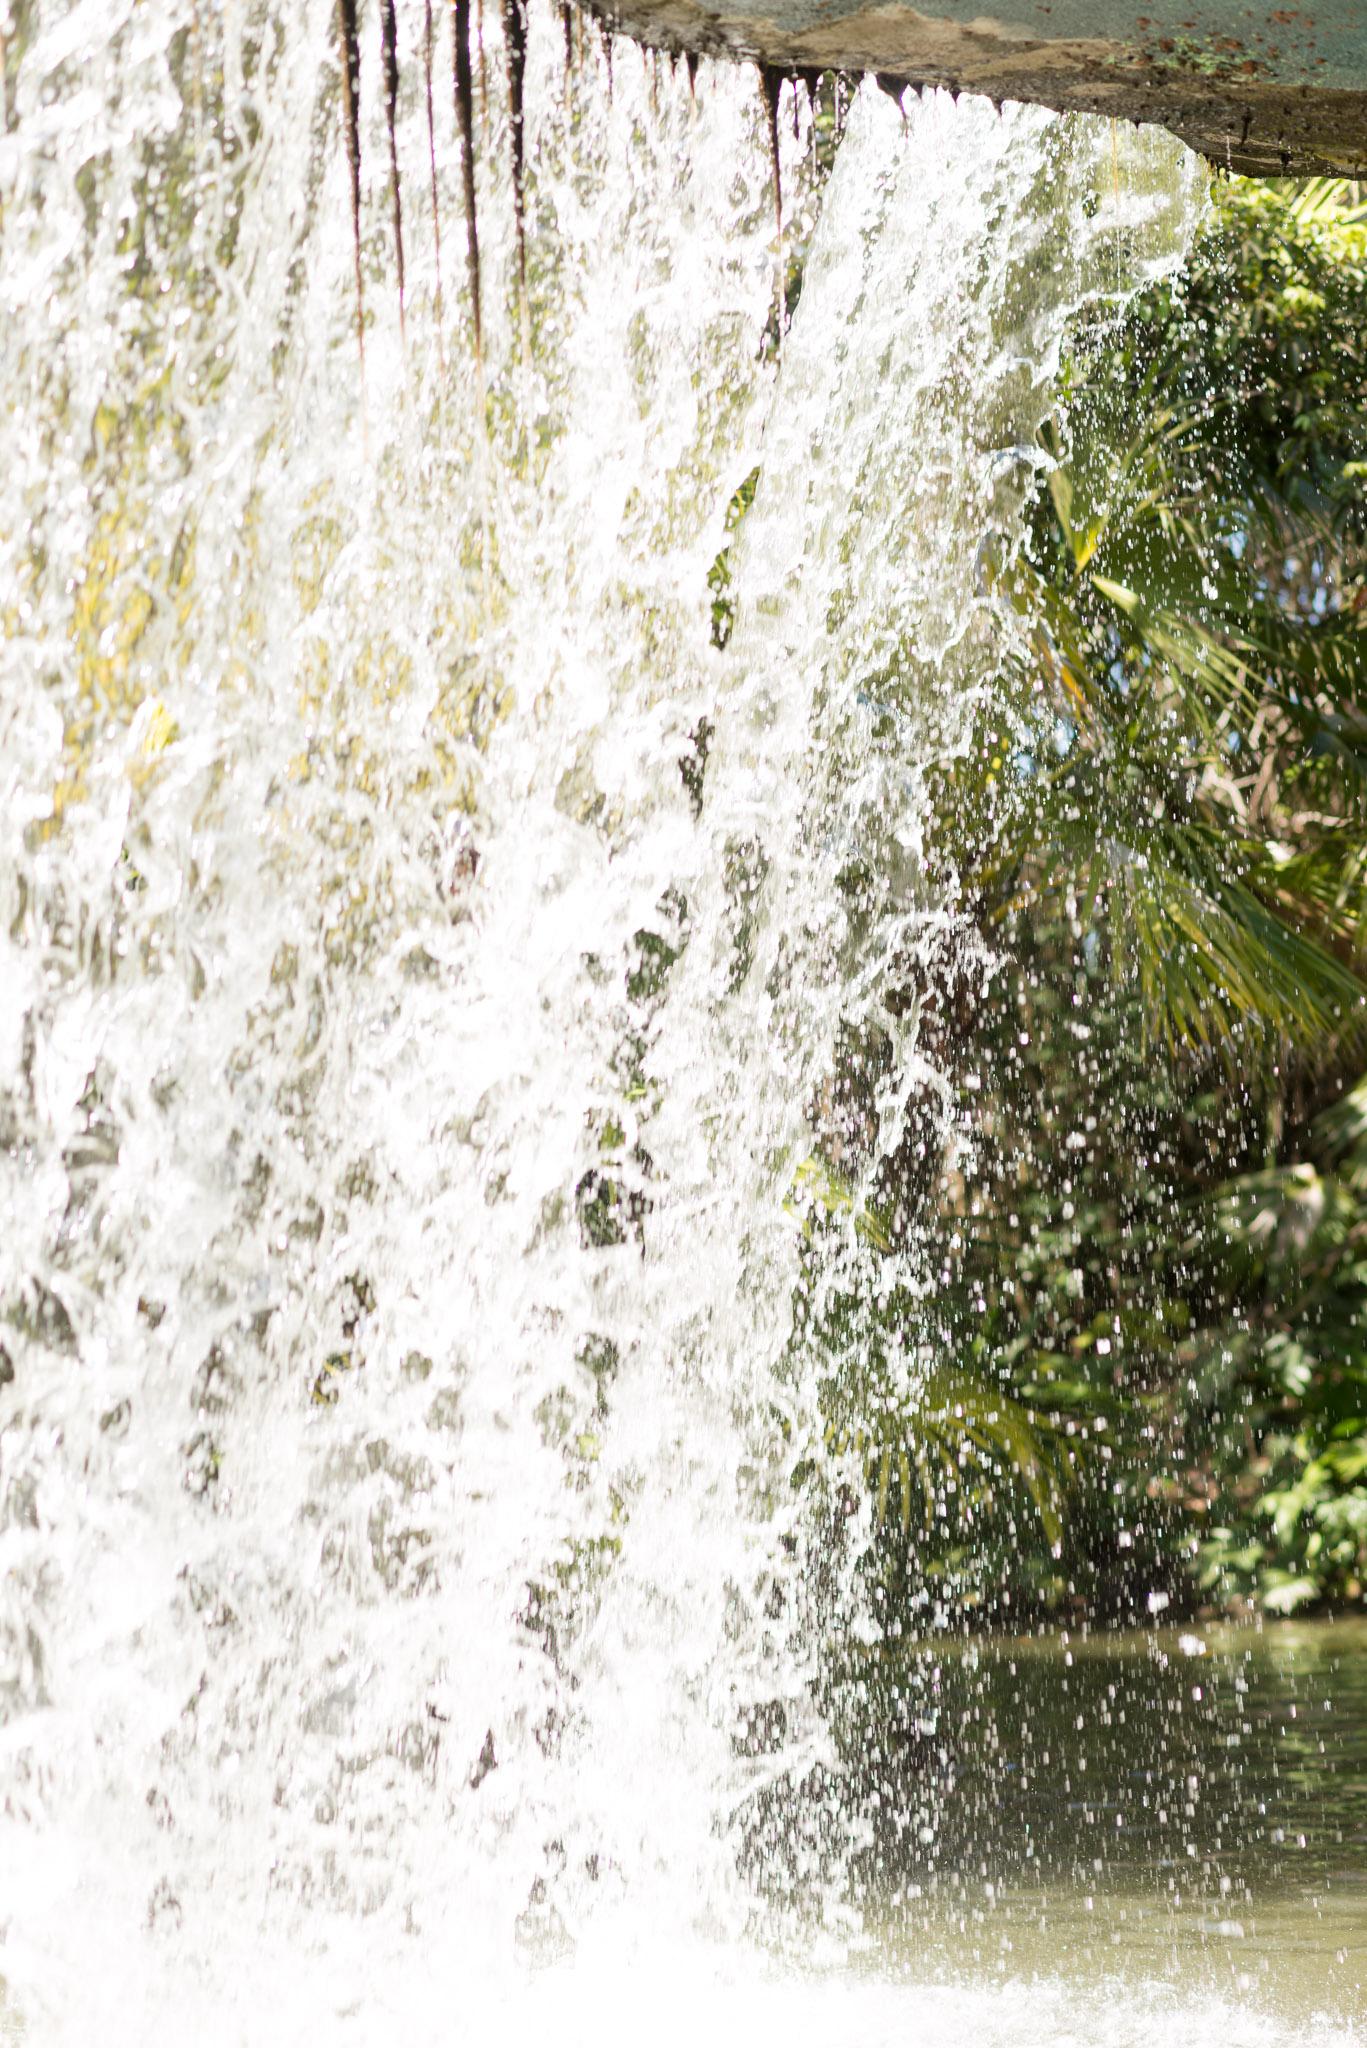 Jungle Cruise - Back Side of Water - Walt Disney World Magic Kingdom